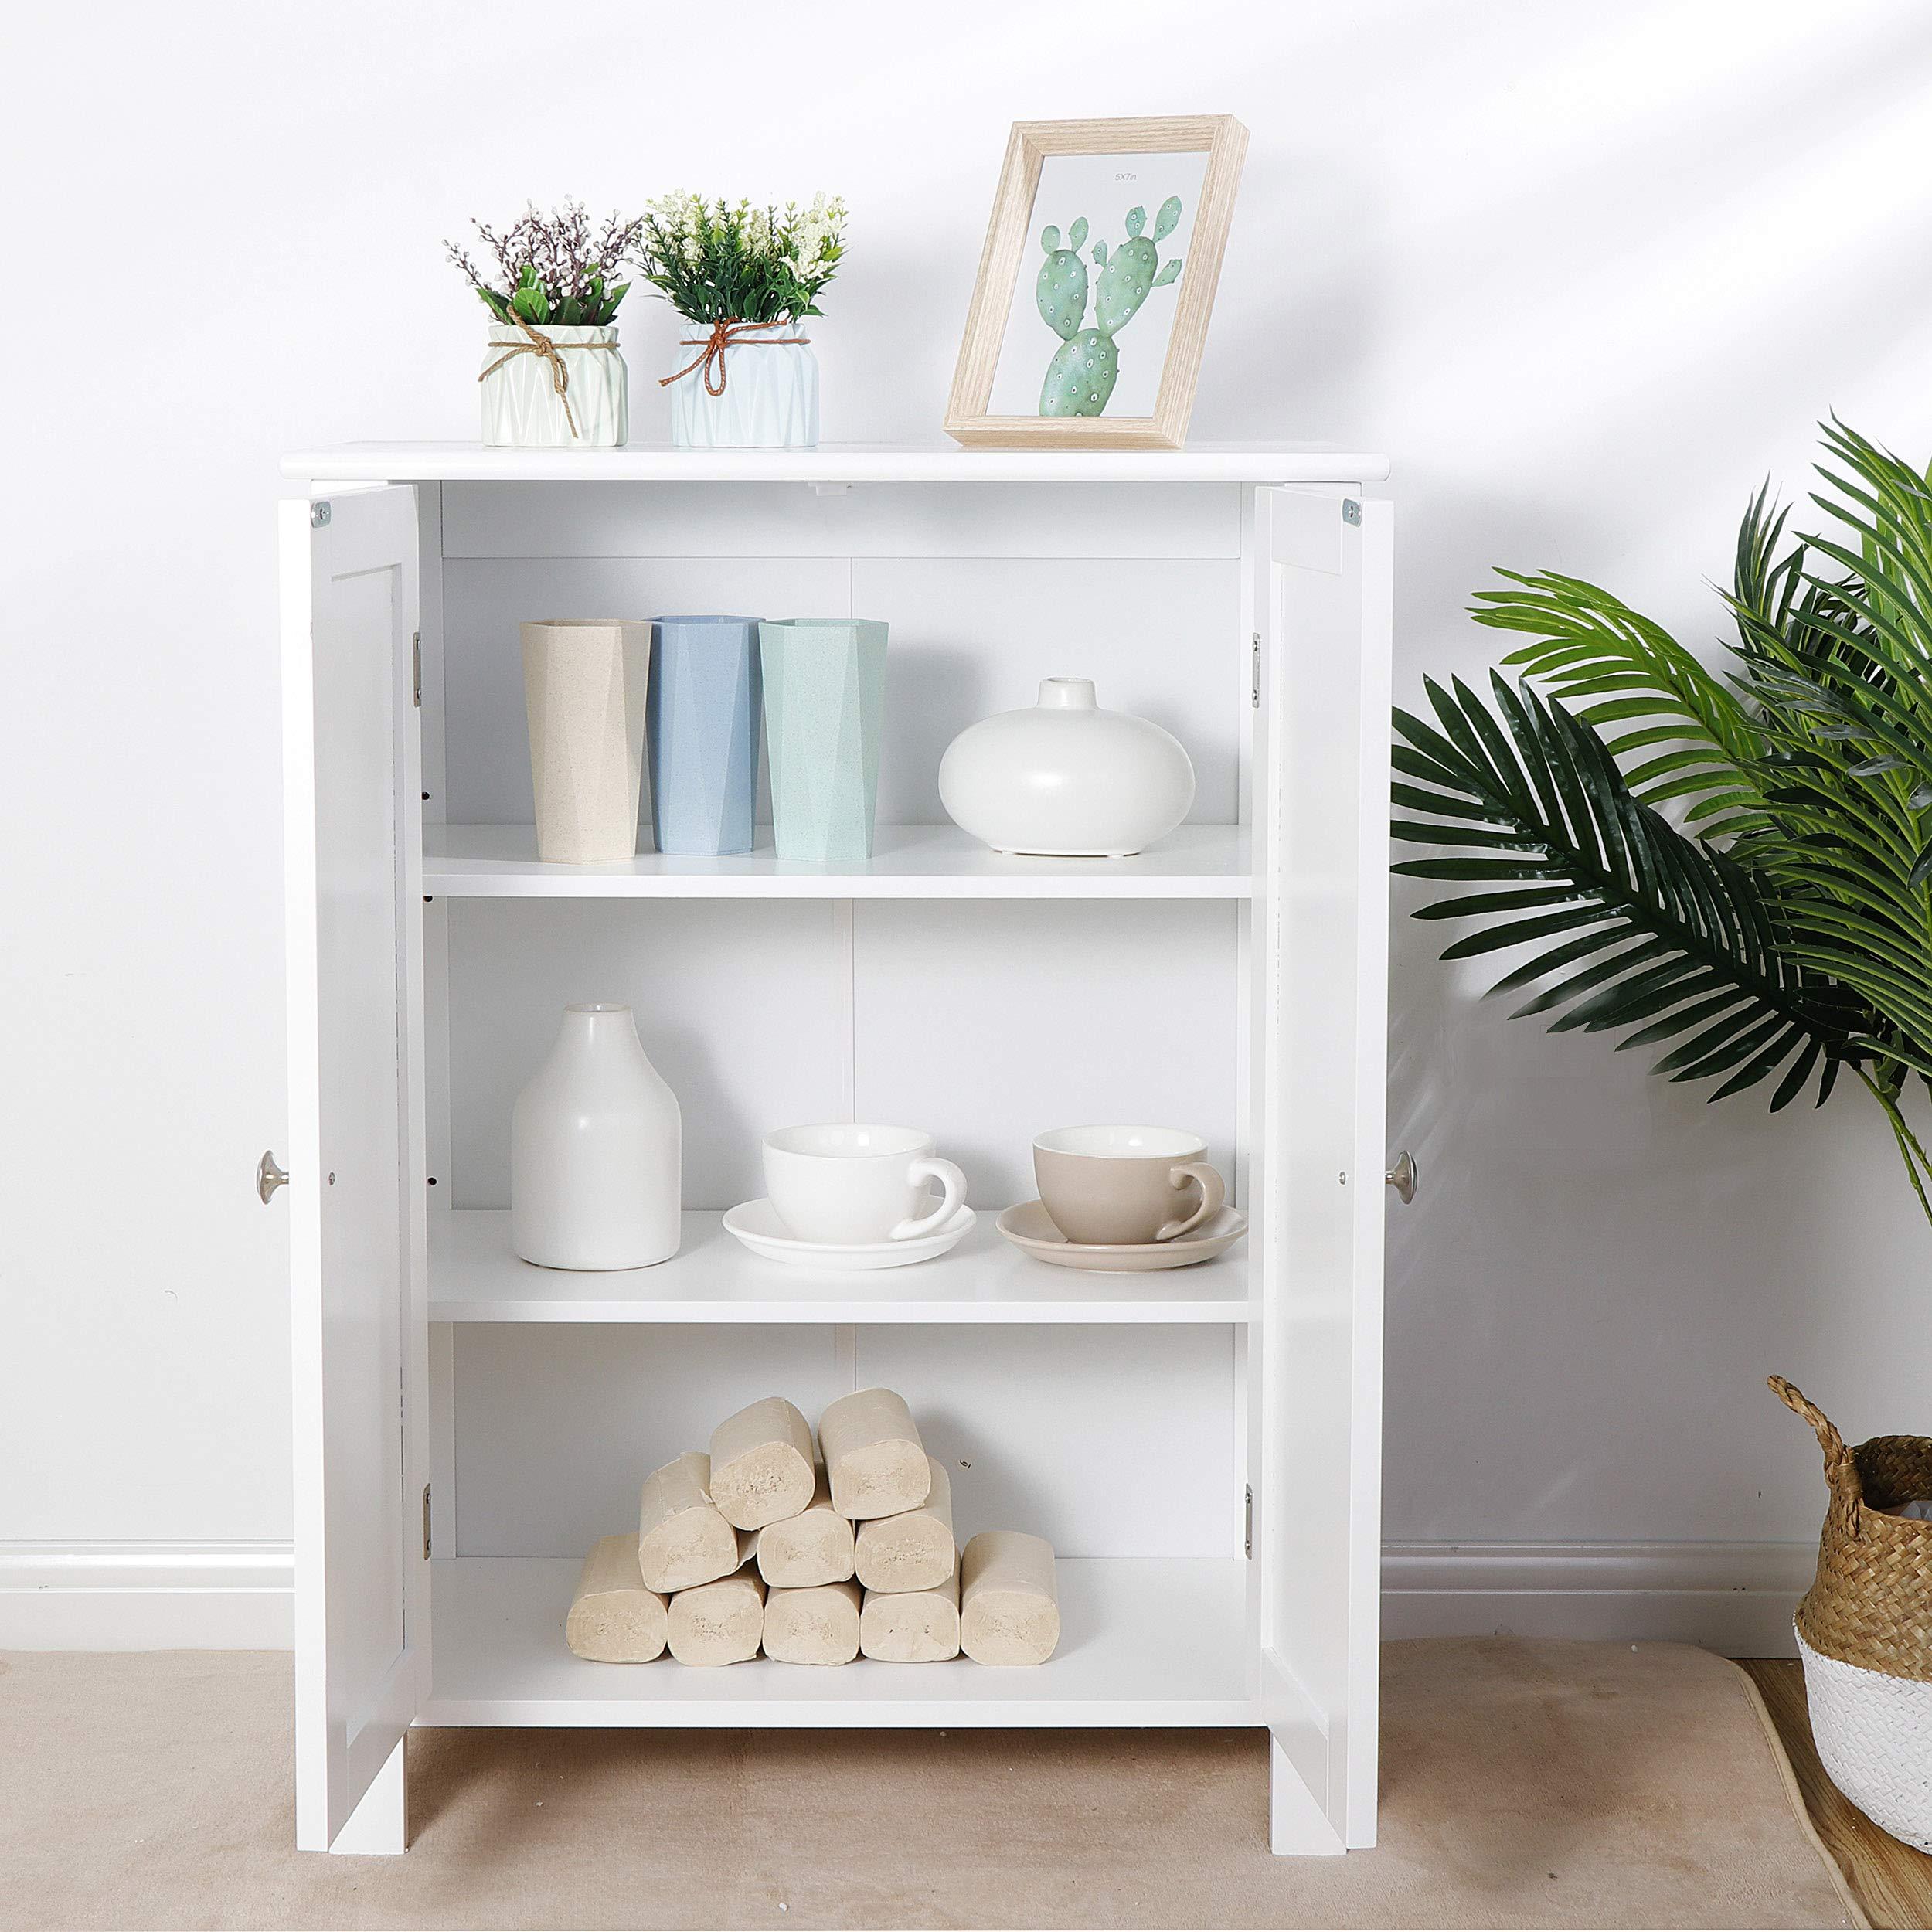 SUPER DEAL Modern Bathroom Floor Storage Cabinet with Adjustable Shelf and Double DoorRust&Moisture Proof, Living Room Modern Home Furniture Storage Organizer Cabinet by SUPER DEAL